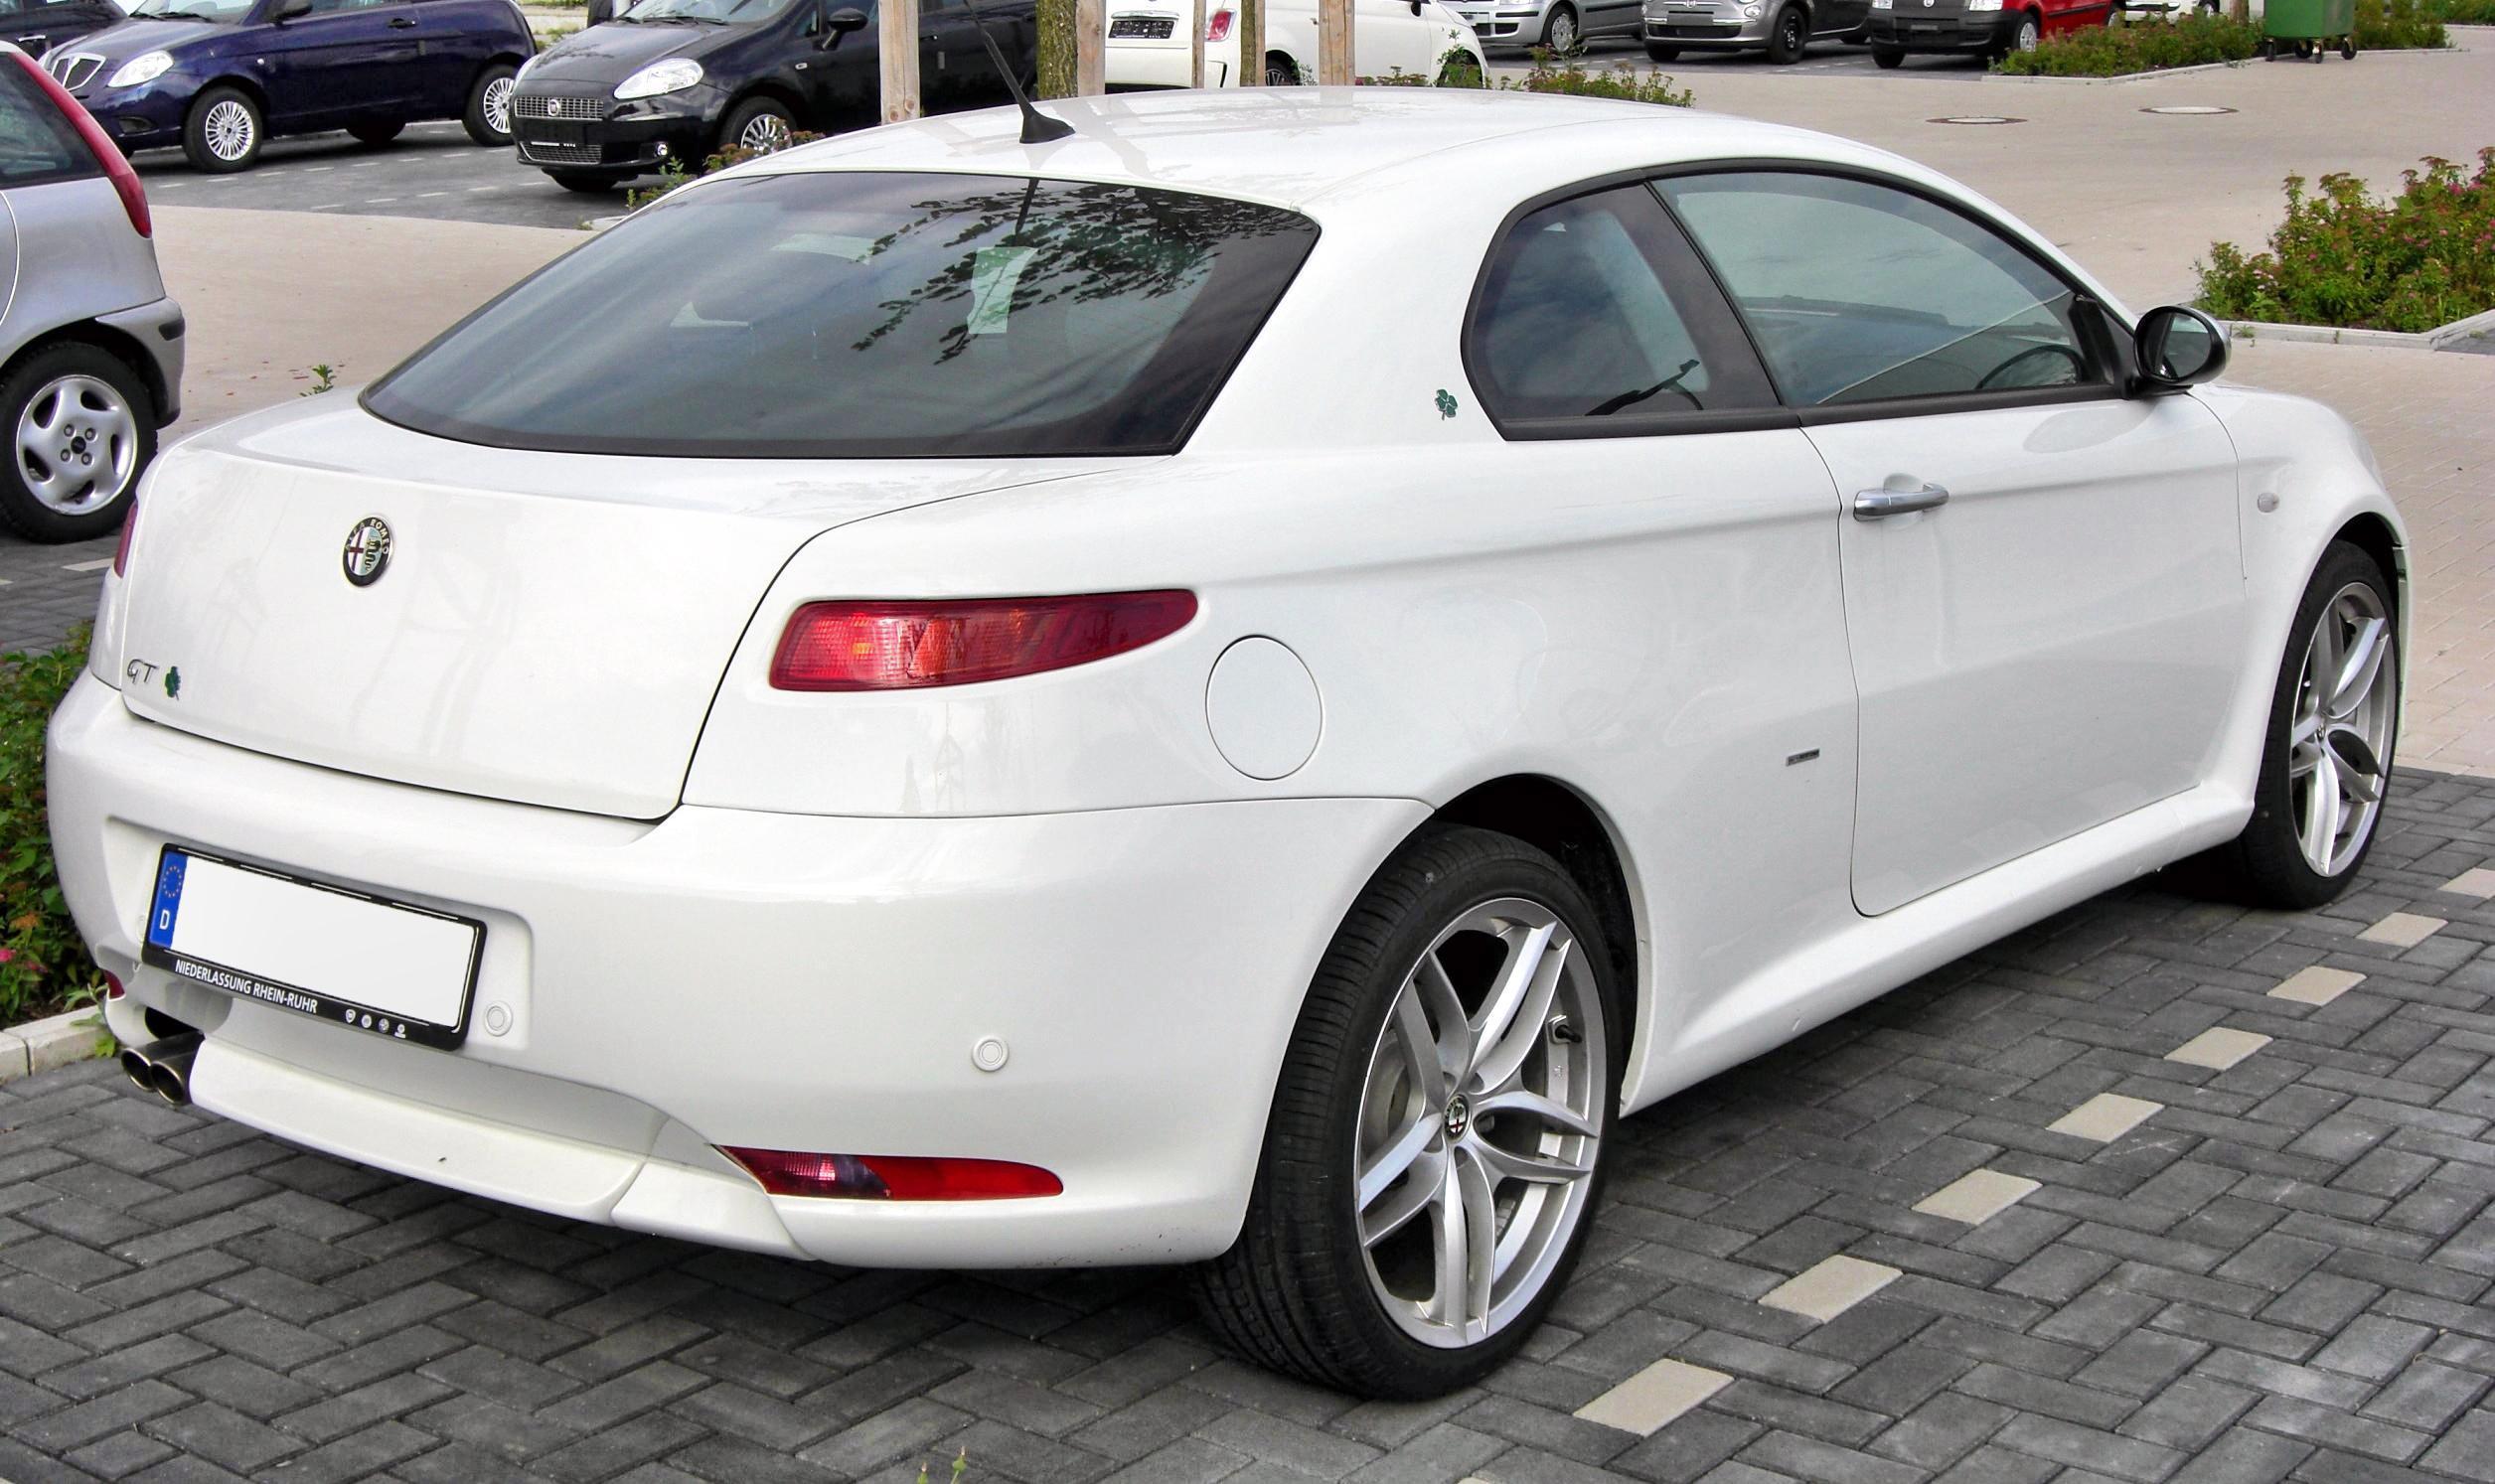 The Alfa Romeo V6 Engine HighPerformance Manual SpeedPro